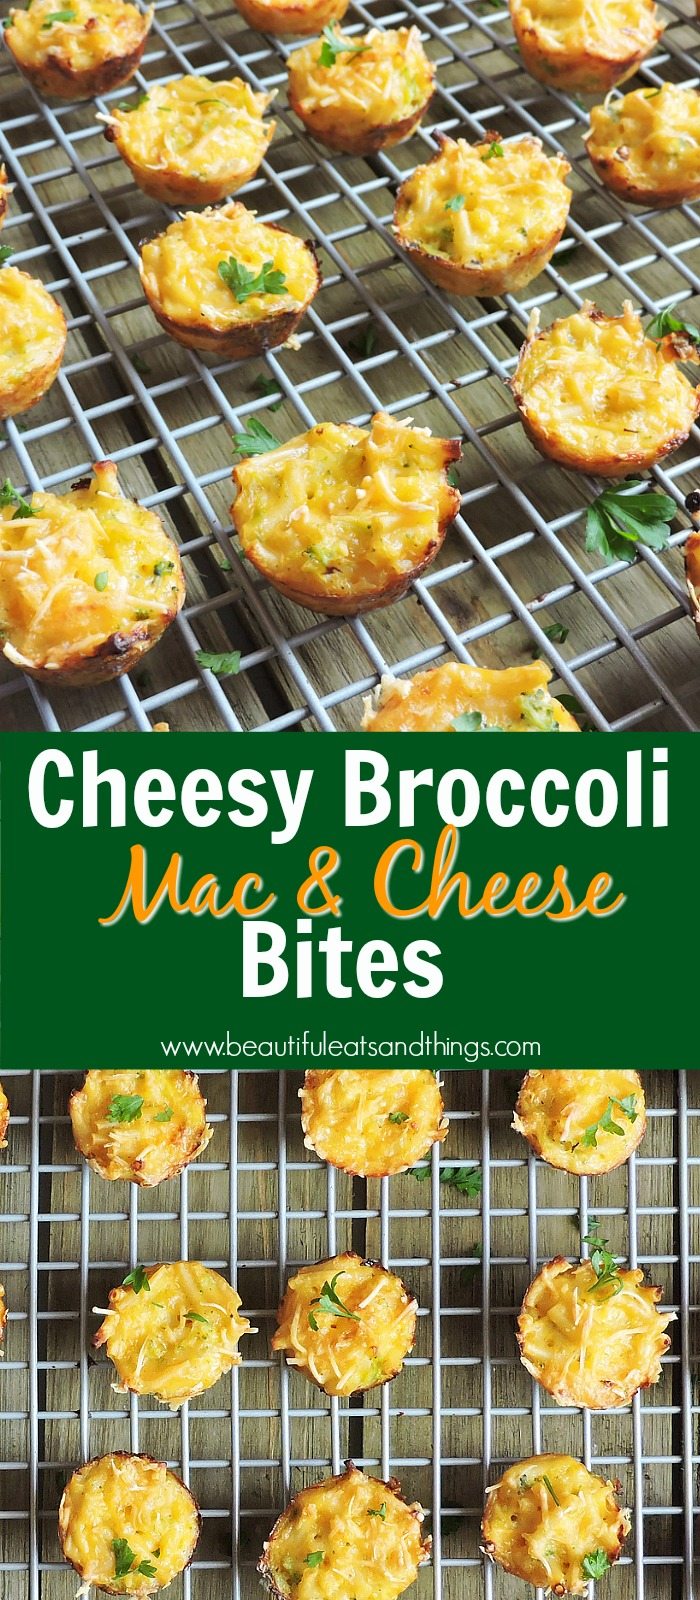 Cheesy Broccoli Mac & Cheese Bites